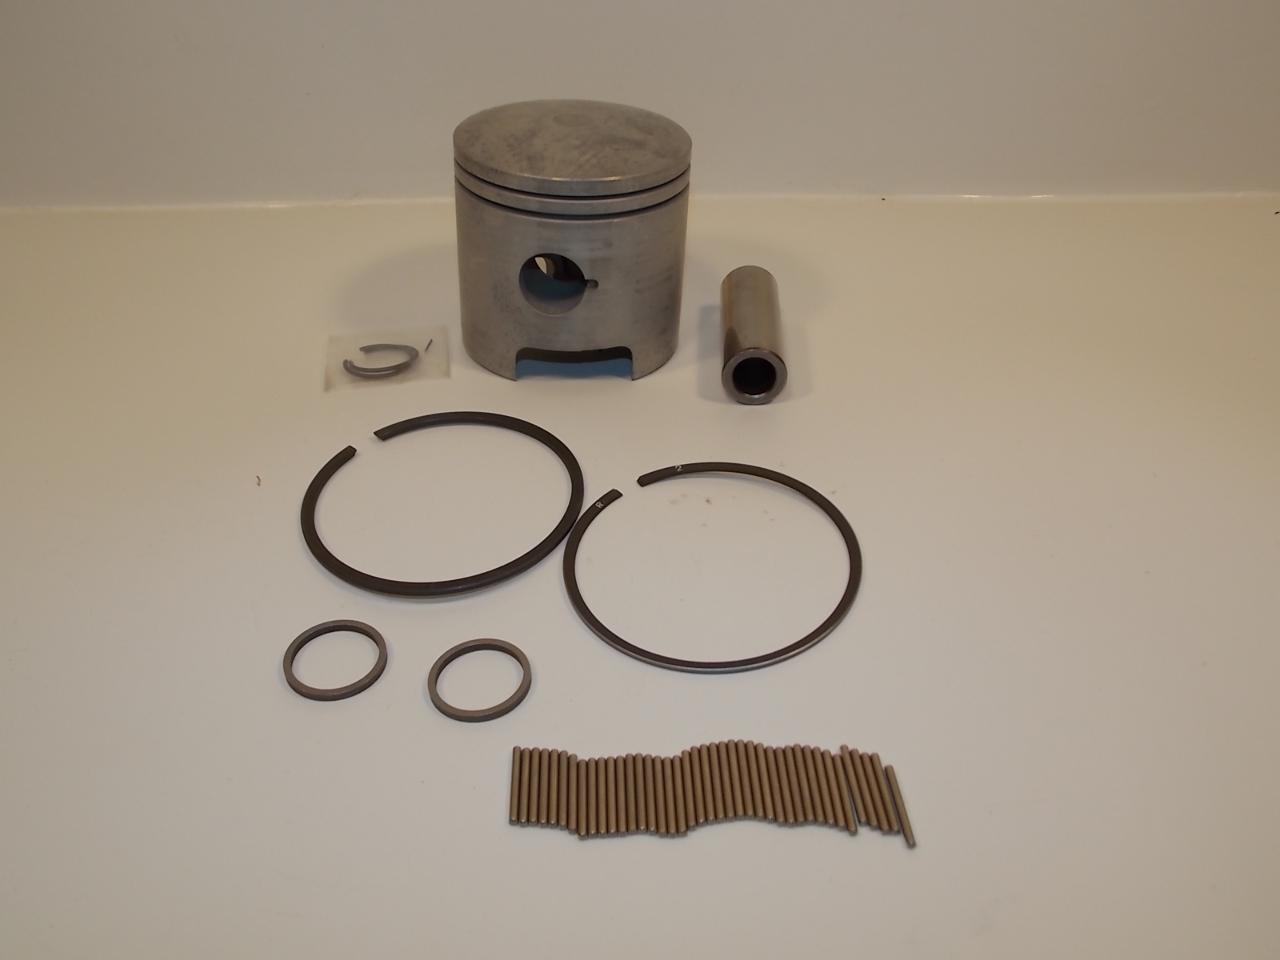 NEW Quicksilver Yamaha Mariner Piston Kit 8486M 1977 1980 1985-1990 1992 30 HP